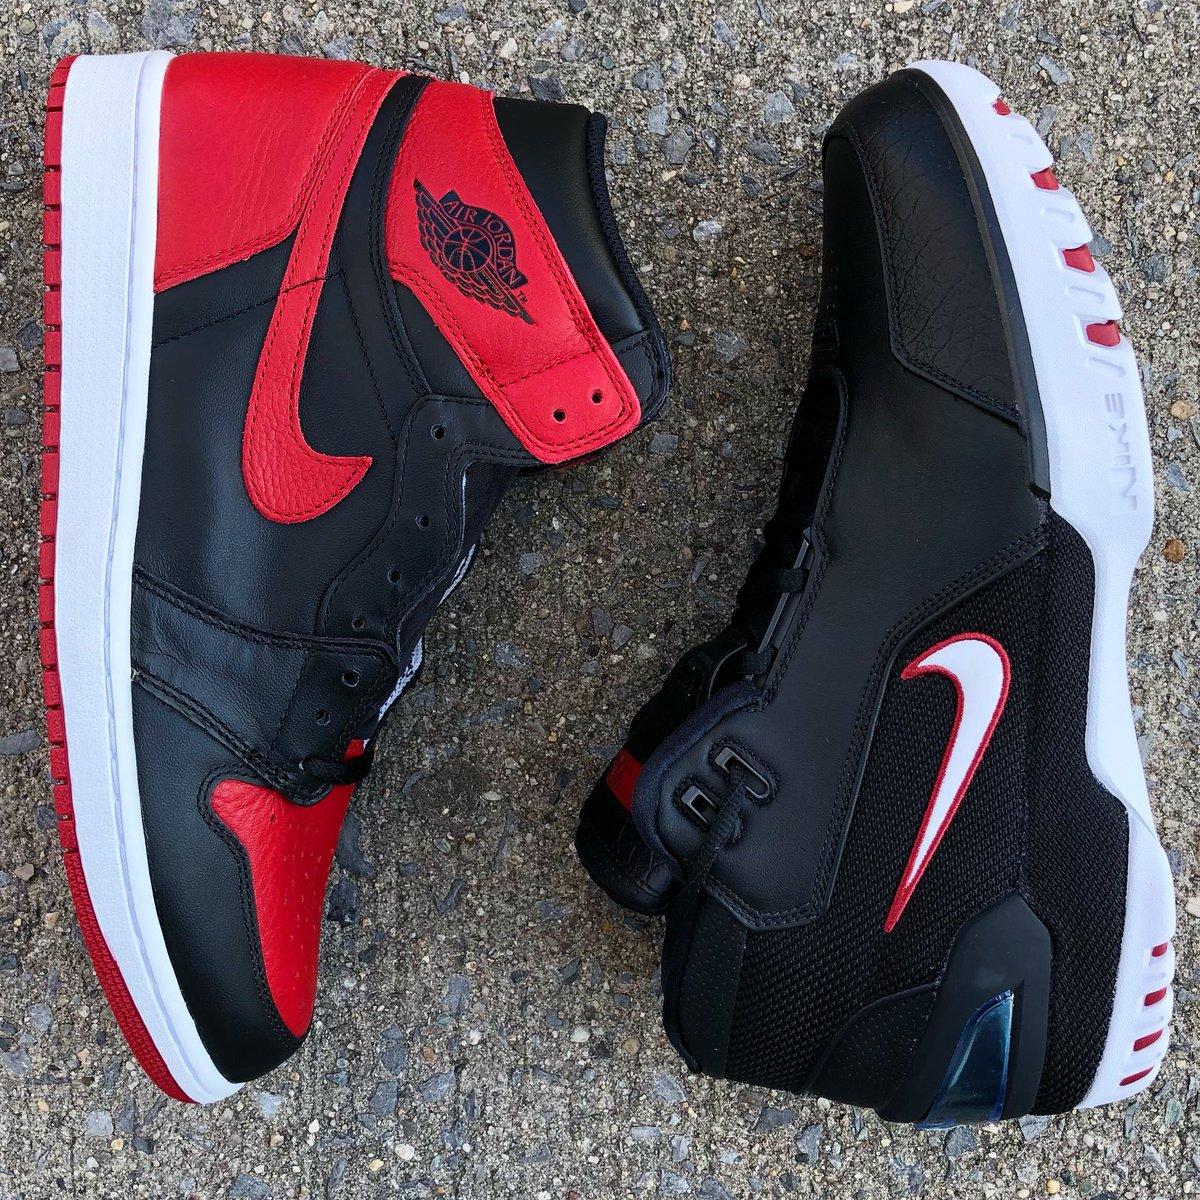 66d14185540  Nike  NikeAir  JordanBrand  Jordan1  Bred1  Classic  Lebron1   AirZoomGeneration  YoungGOATs  YoungKings   Brooklynpic.twitter.com iSZKKJUhPX